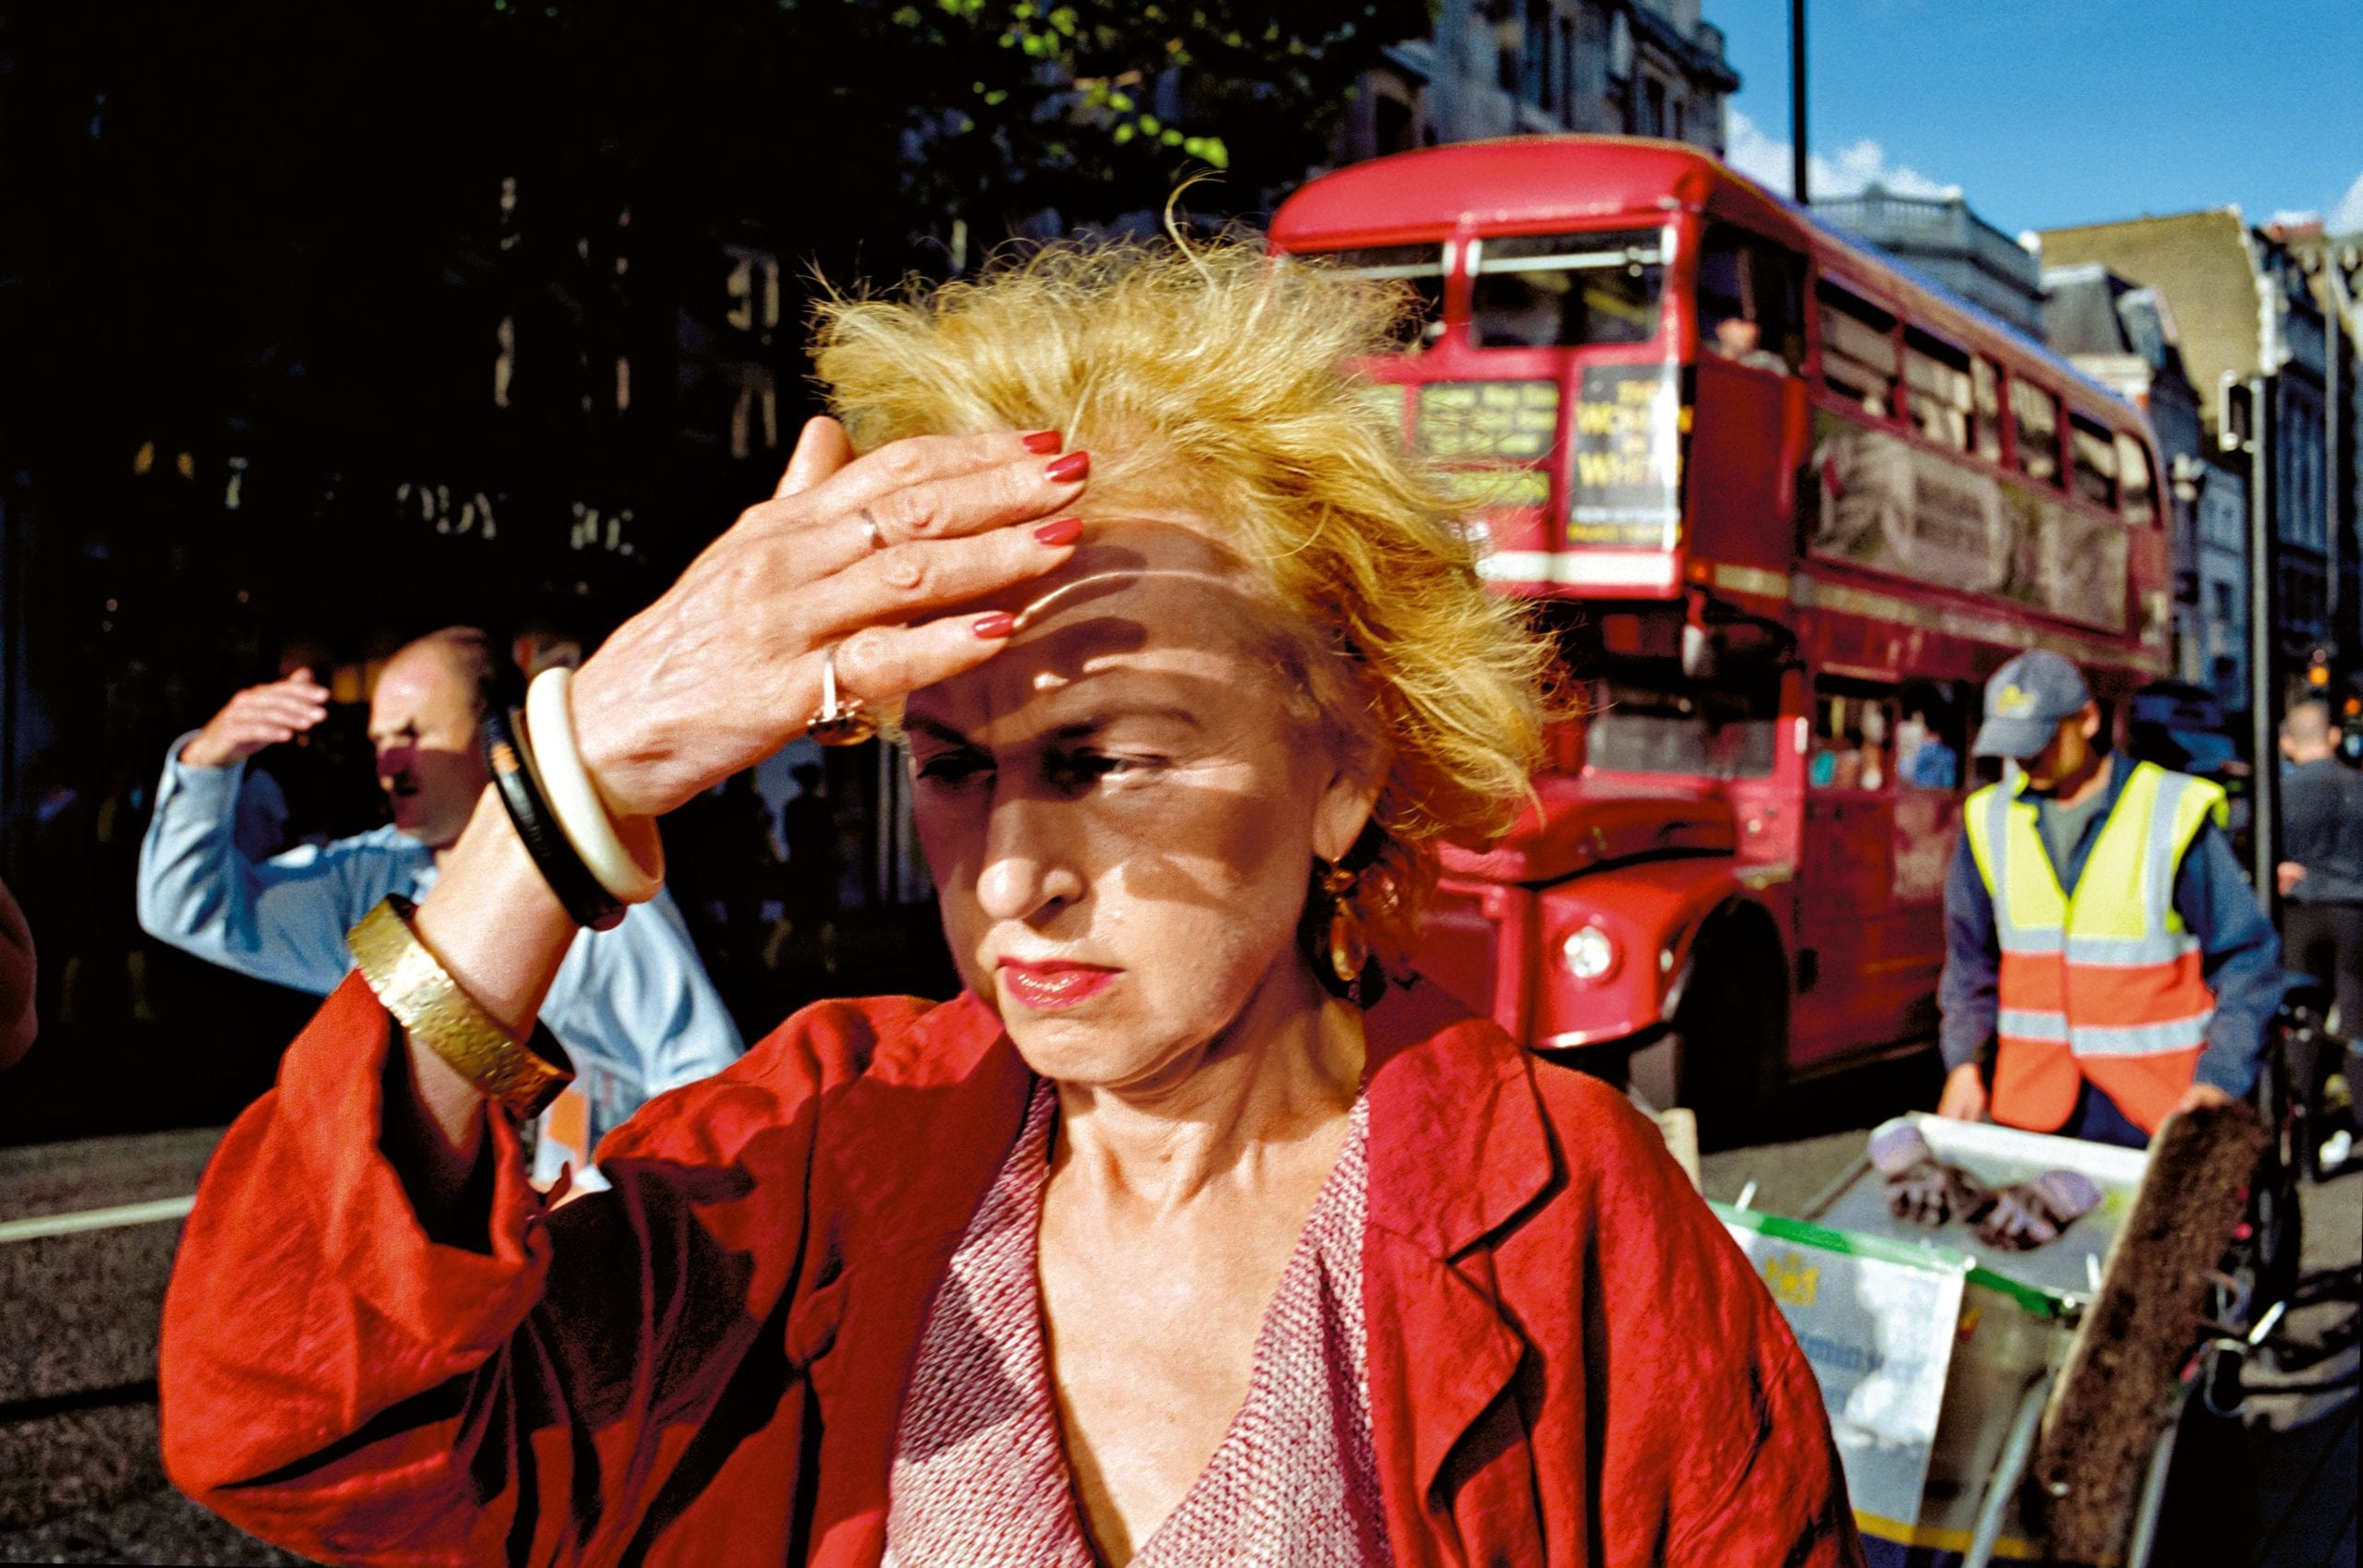 GB. England. London. Oxford Street (c) Matt Stuart, courtesy Magnum Photos